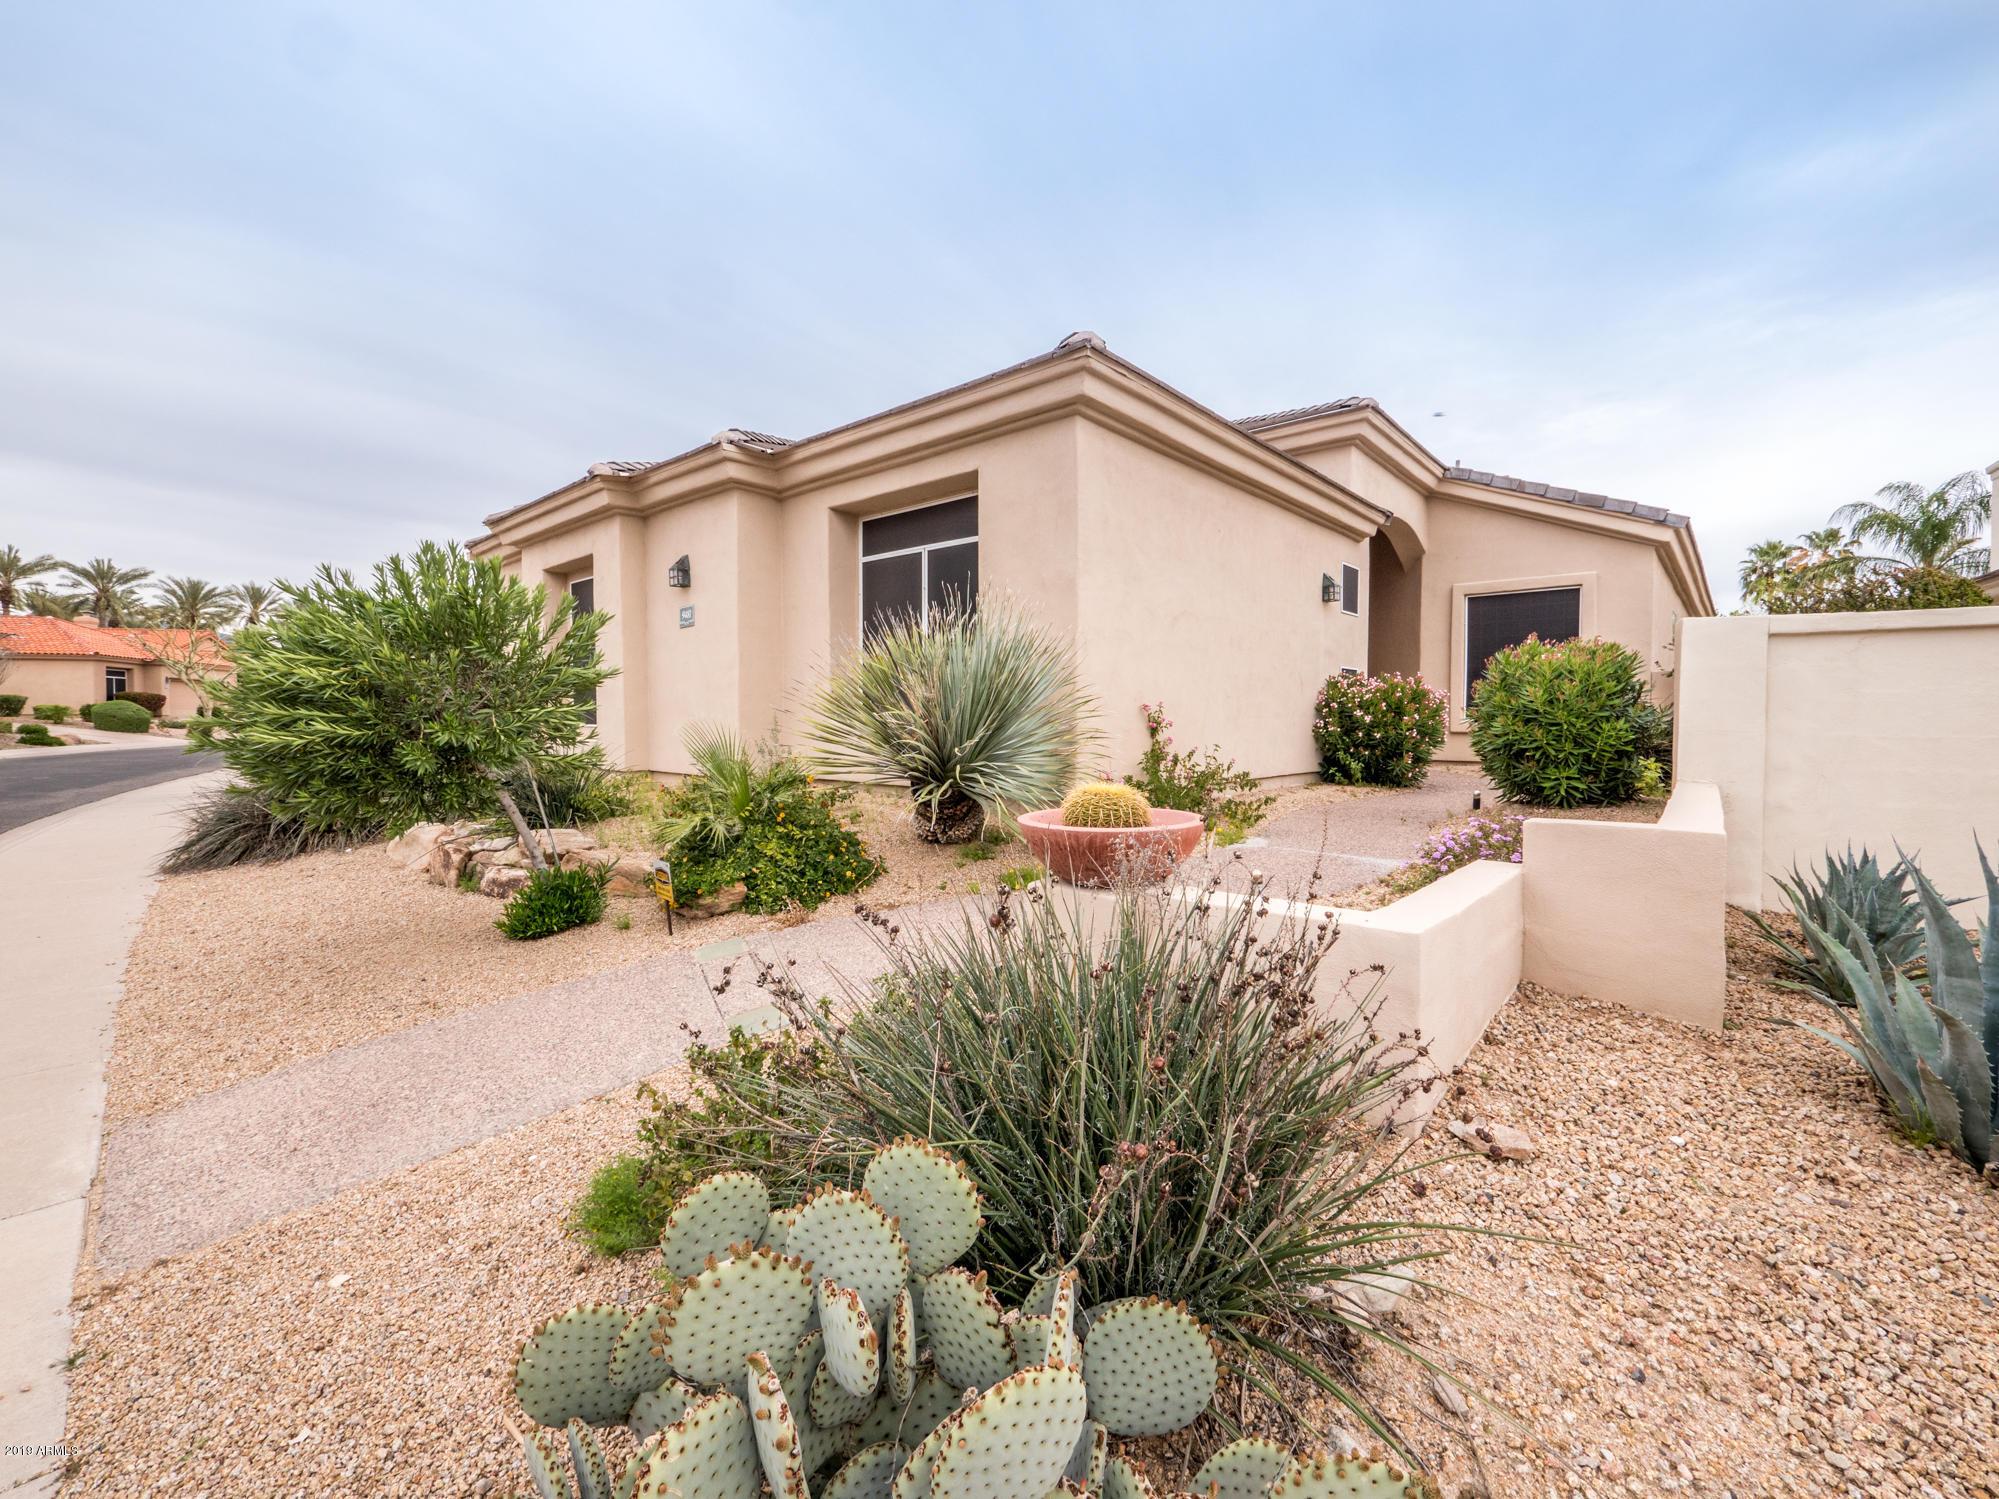 Photo of 9481 N 114TH Way, Scottsdale, AZ 85259